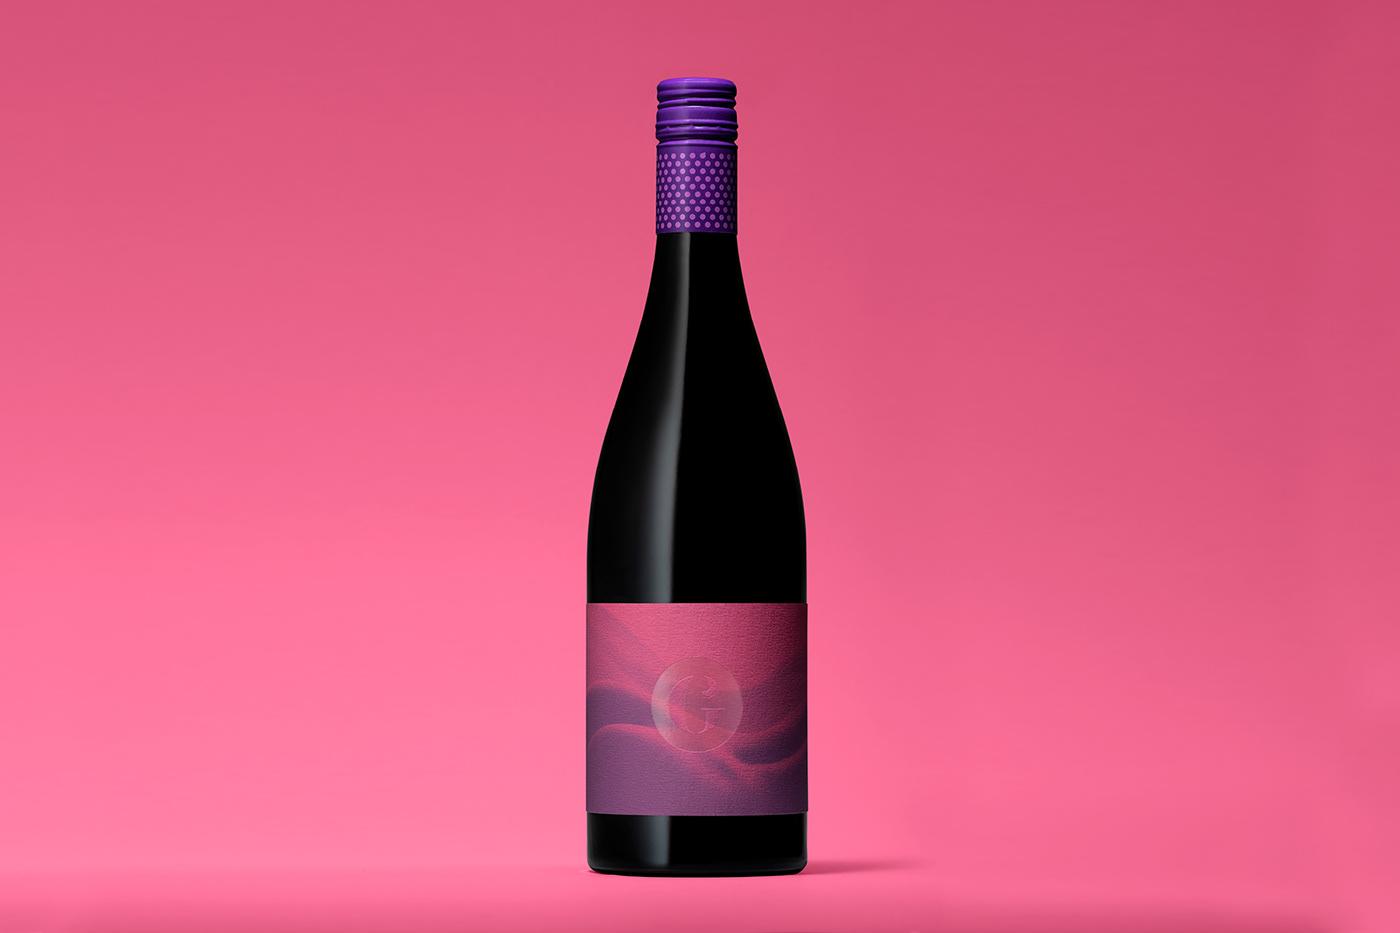 Australia,barossa,graphic design ,label design,packaging design,wine,wine branding,wine label